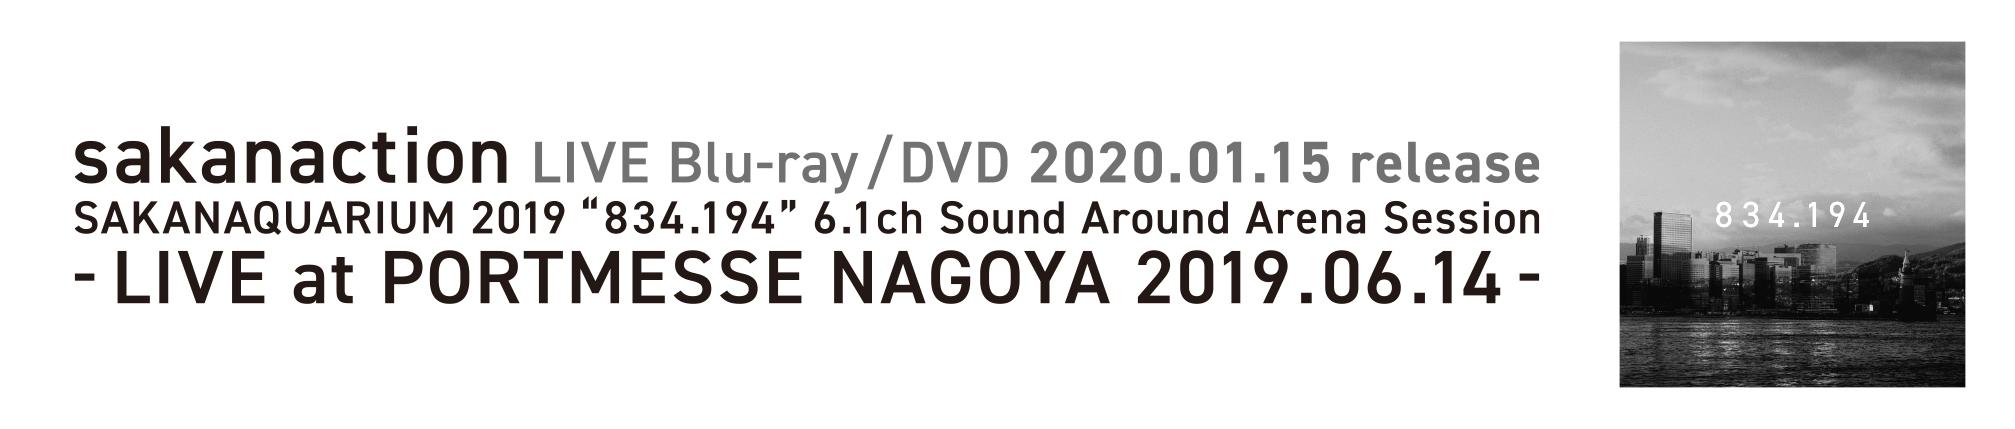 Blu-ray_sakanaquarium2019